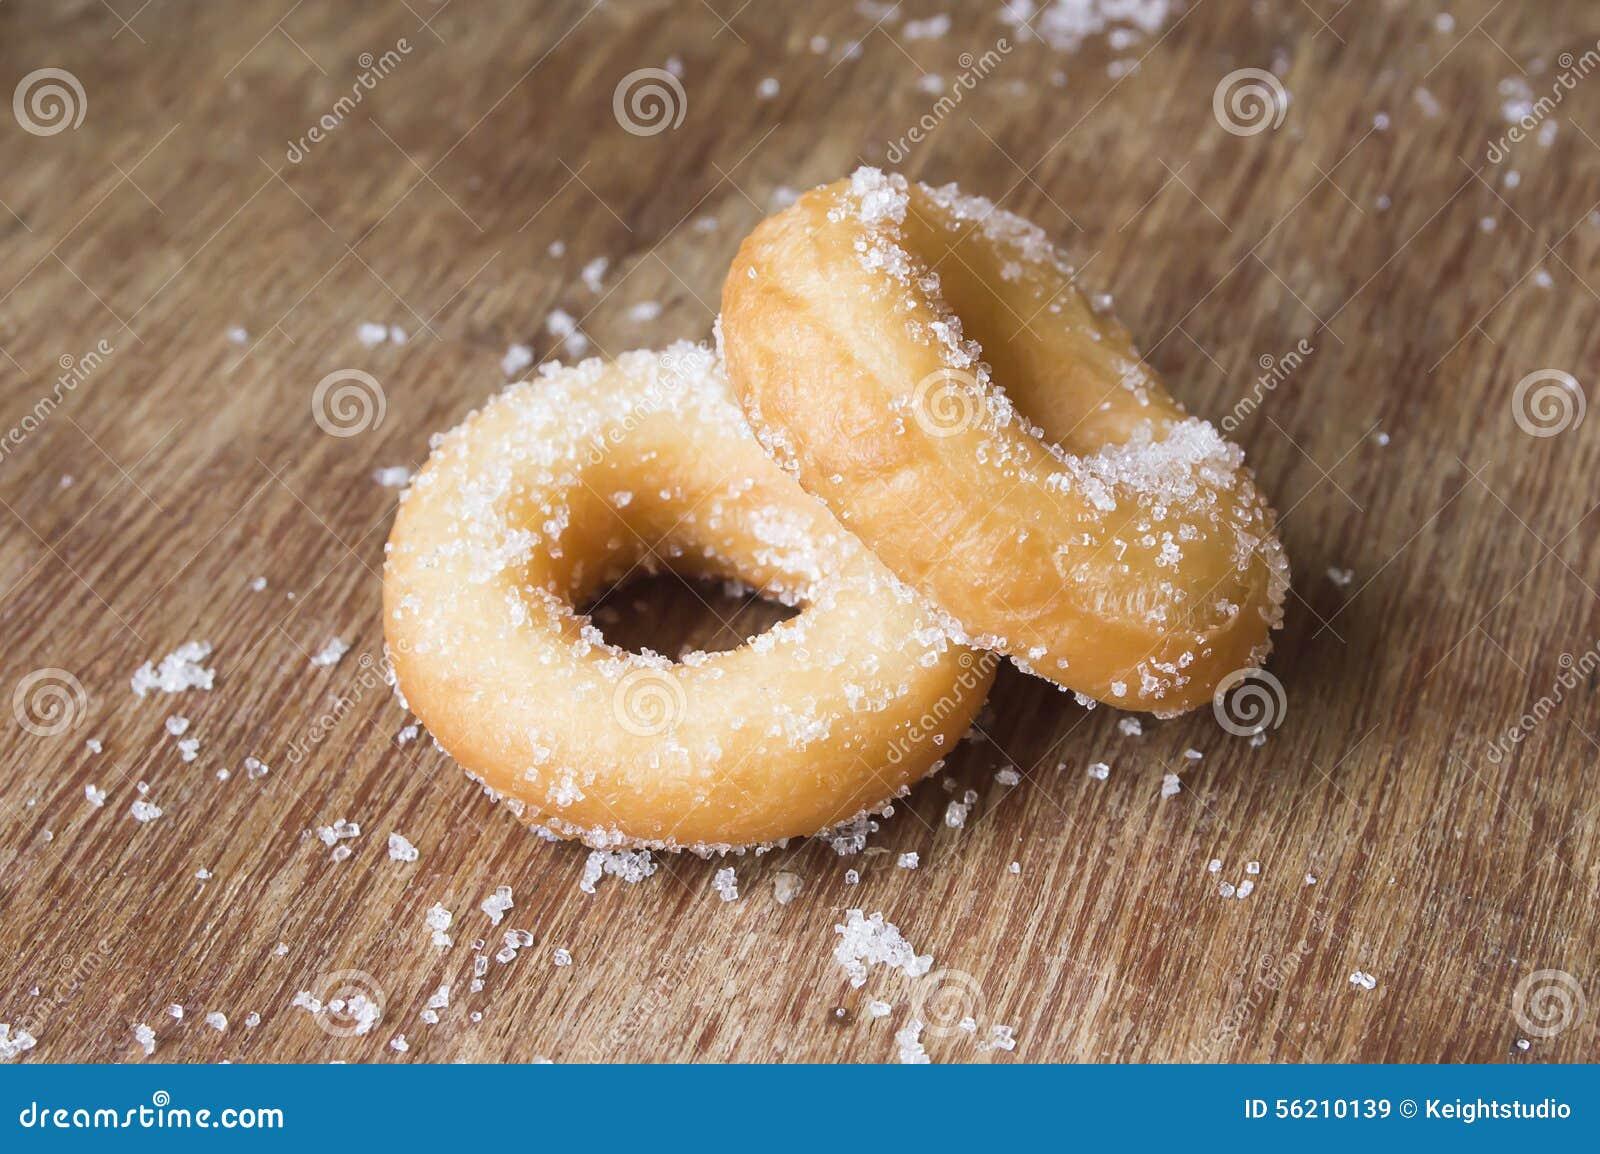 Homemade Doughnut Making Business